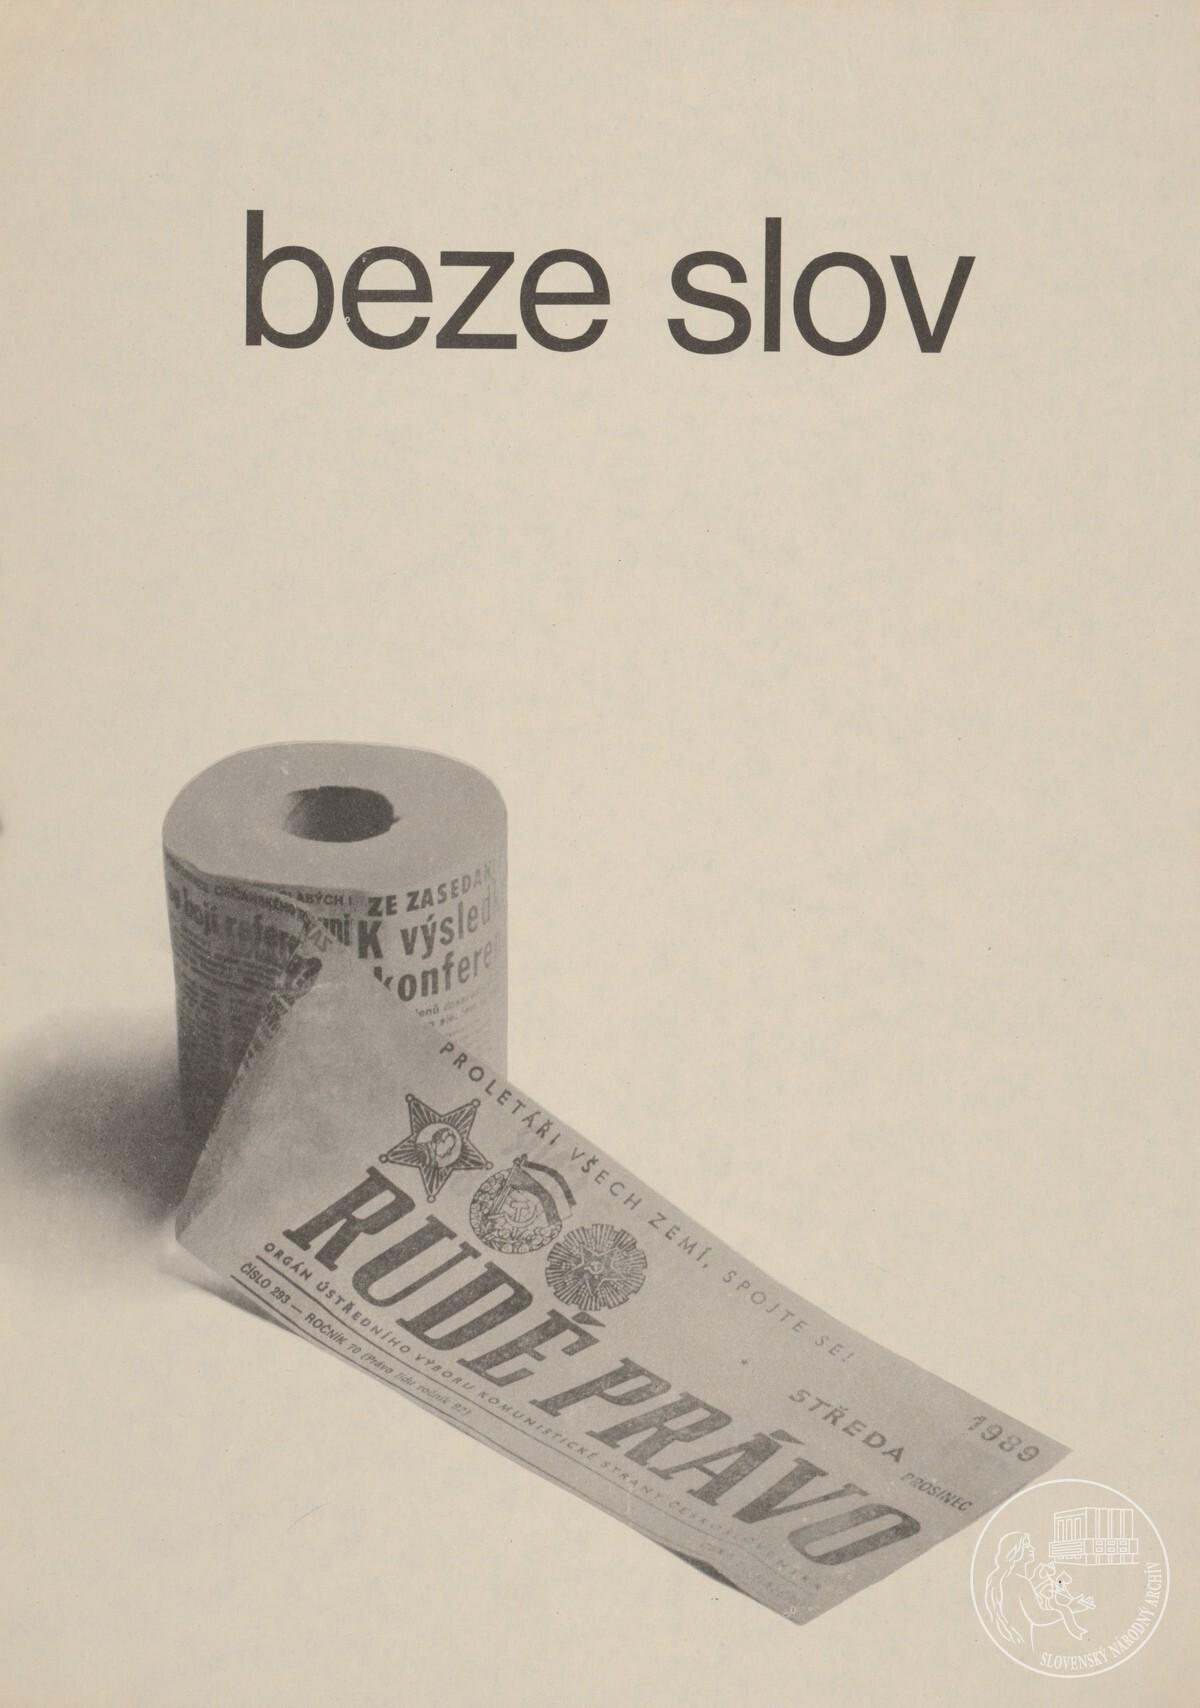 Beze slov. Slovenský národný archív